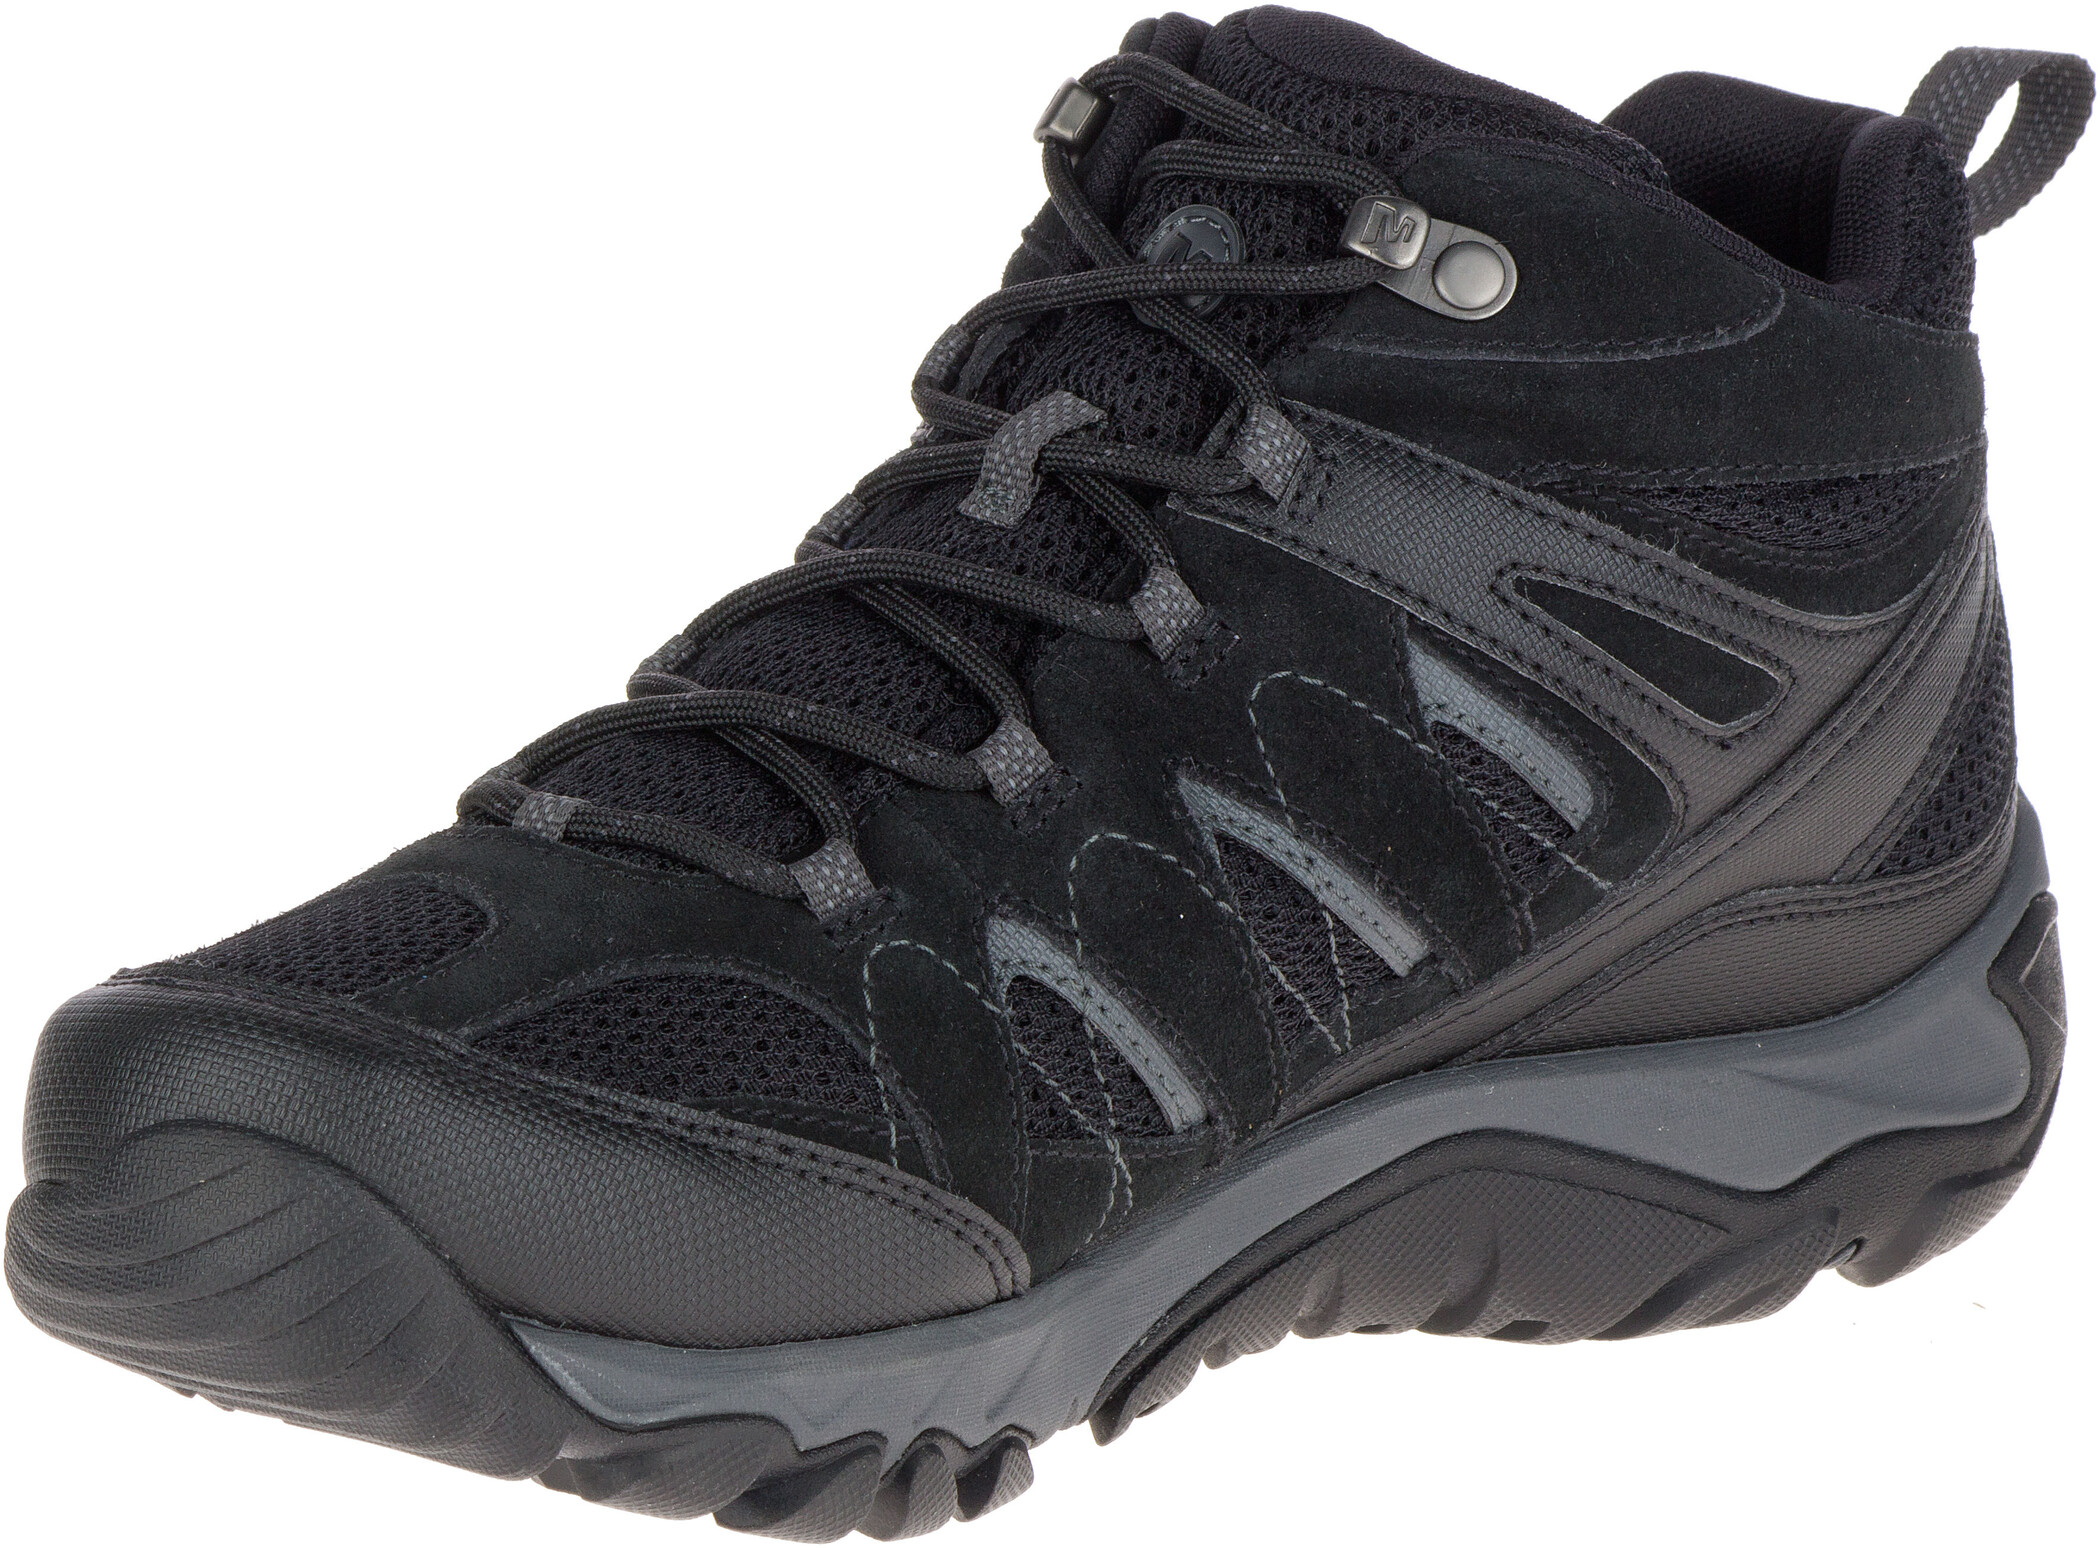 Merrell Outmost MID Vent GTX Schuhe Herren black